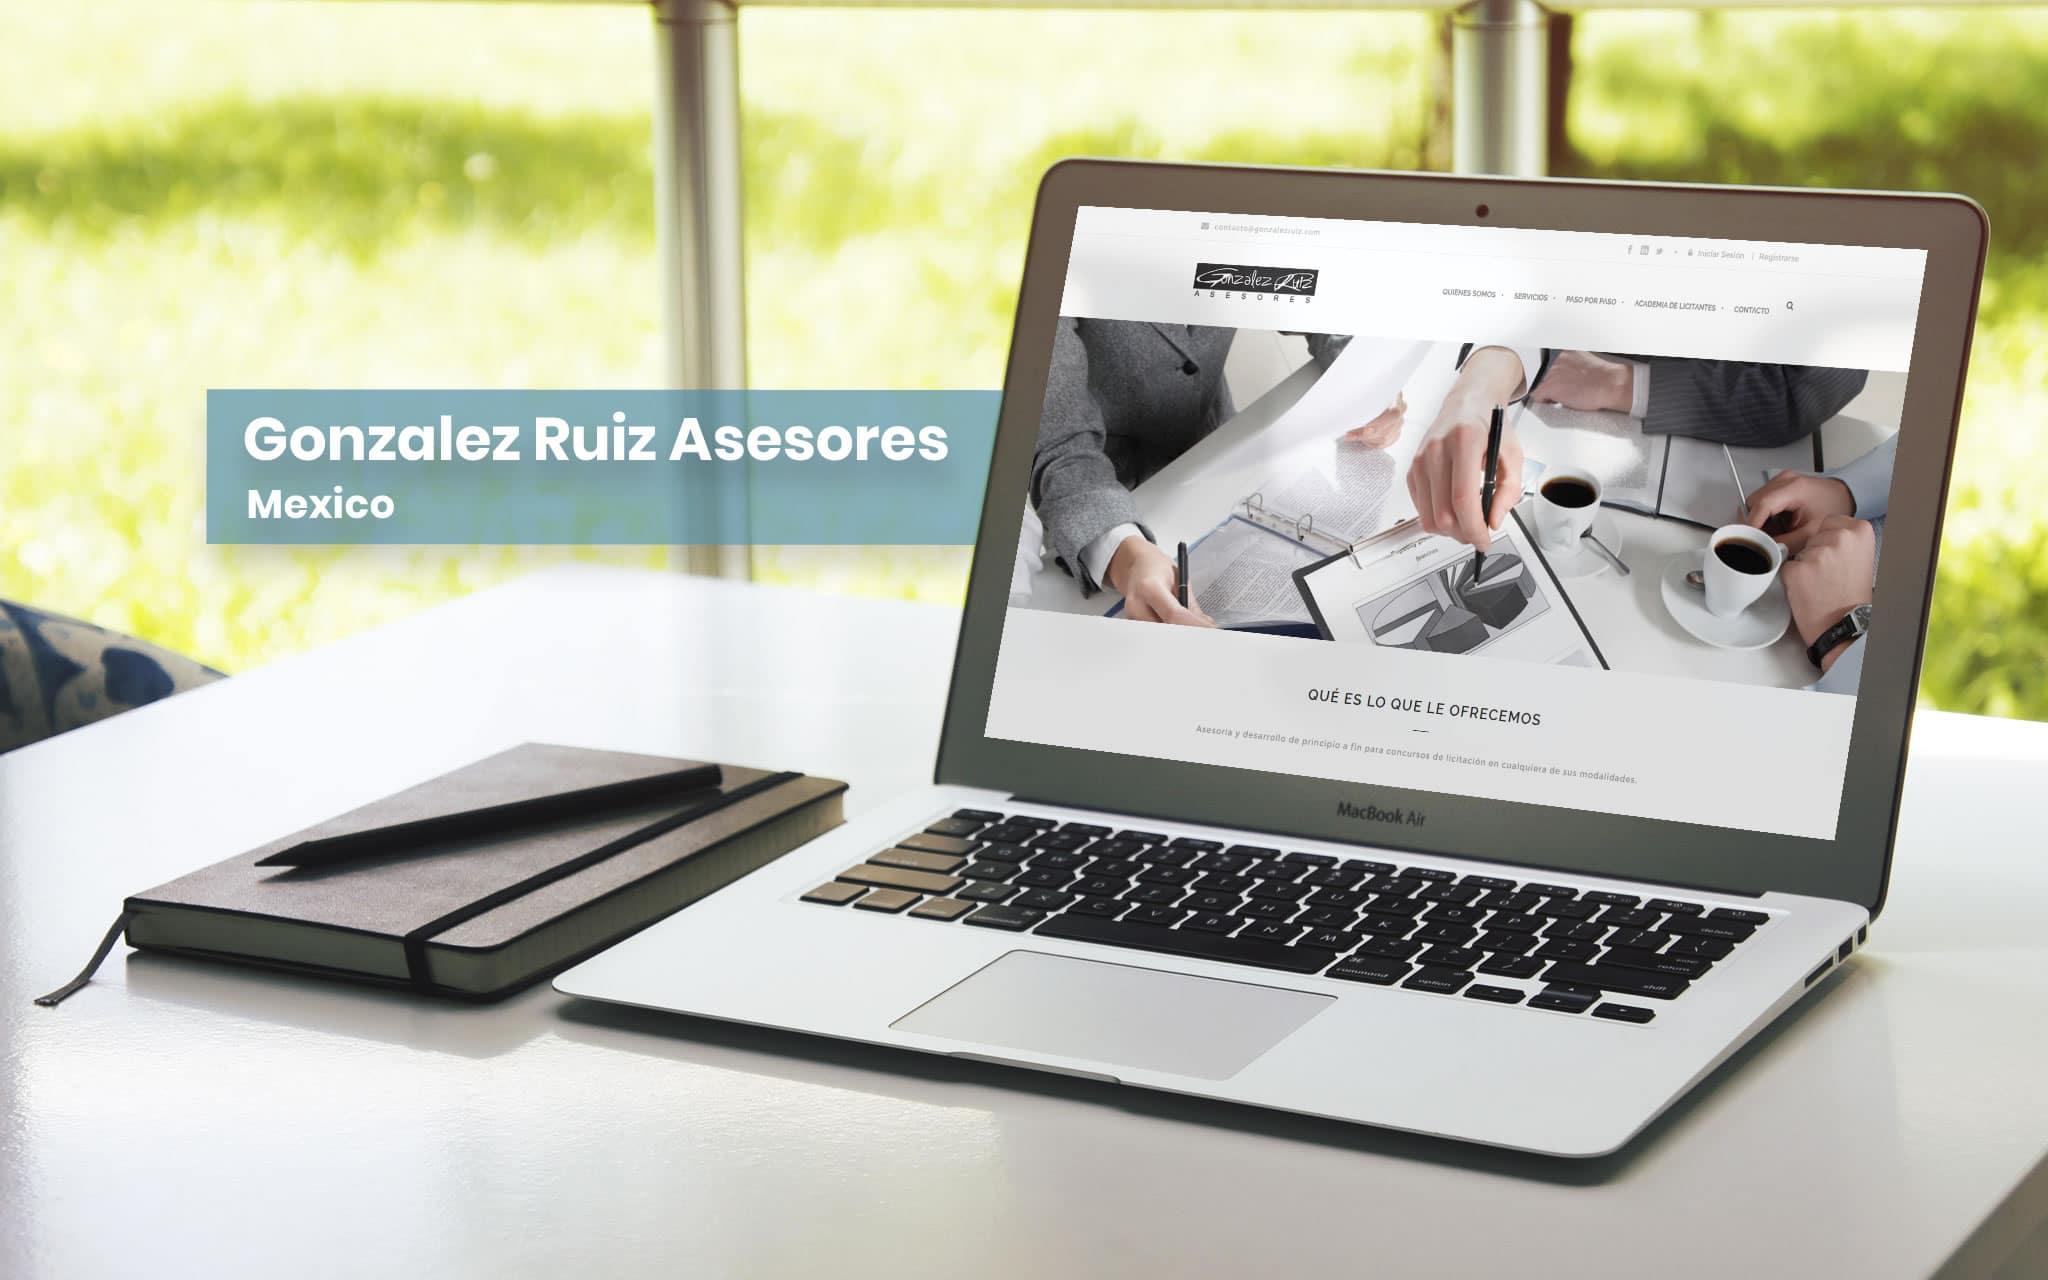 Gonzalez Ruiz Asesores - México